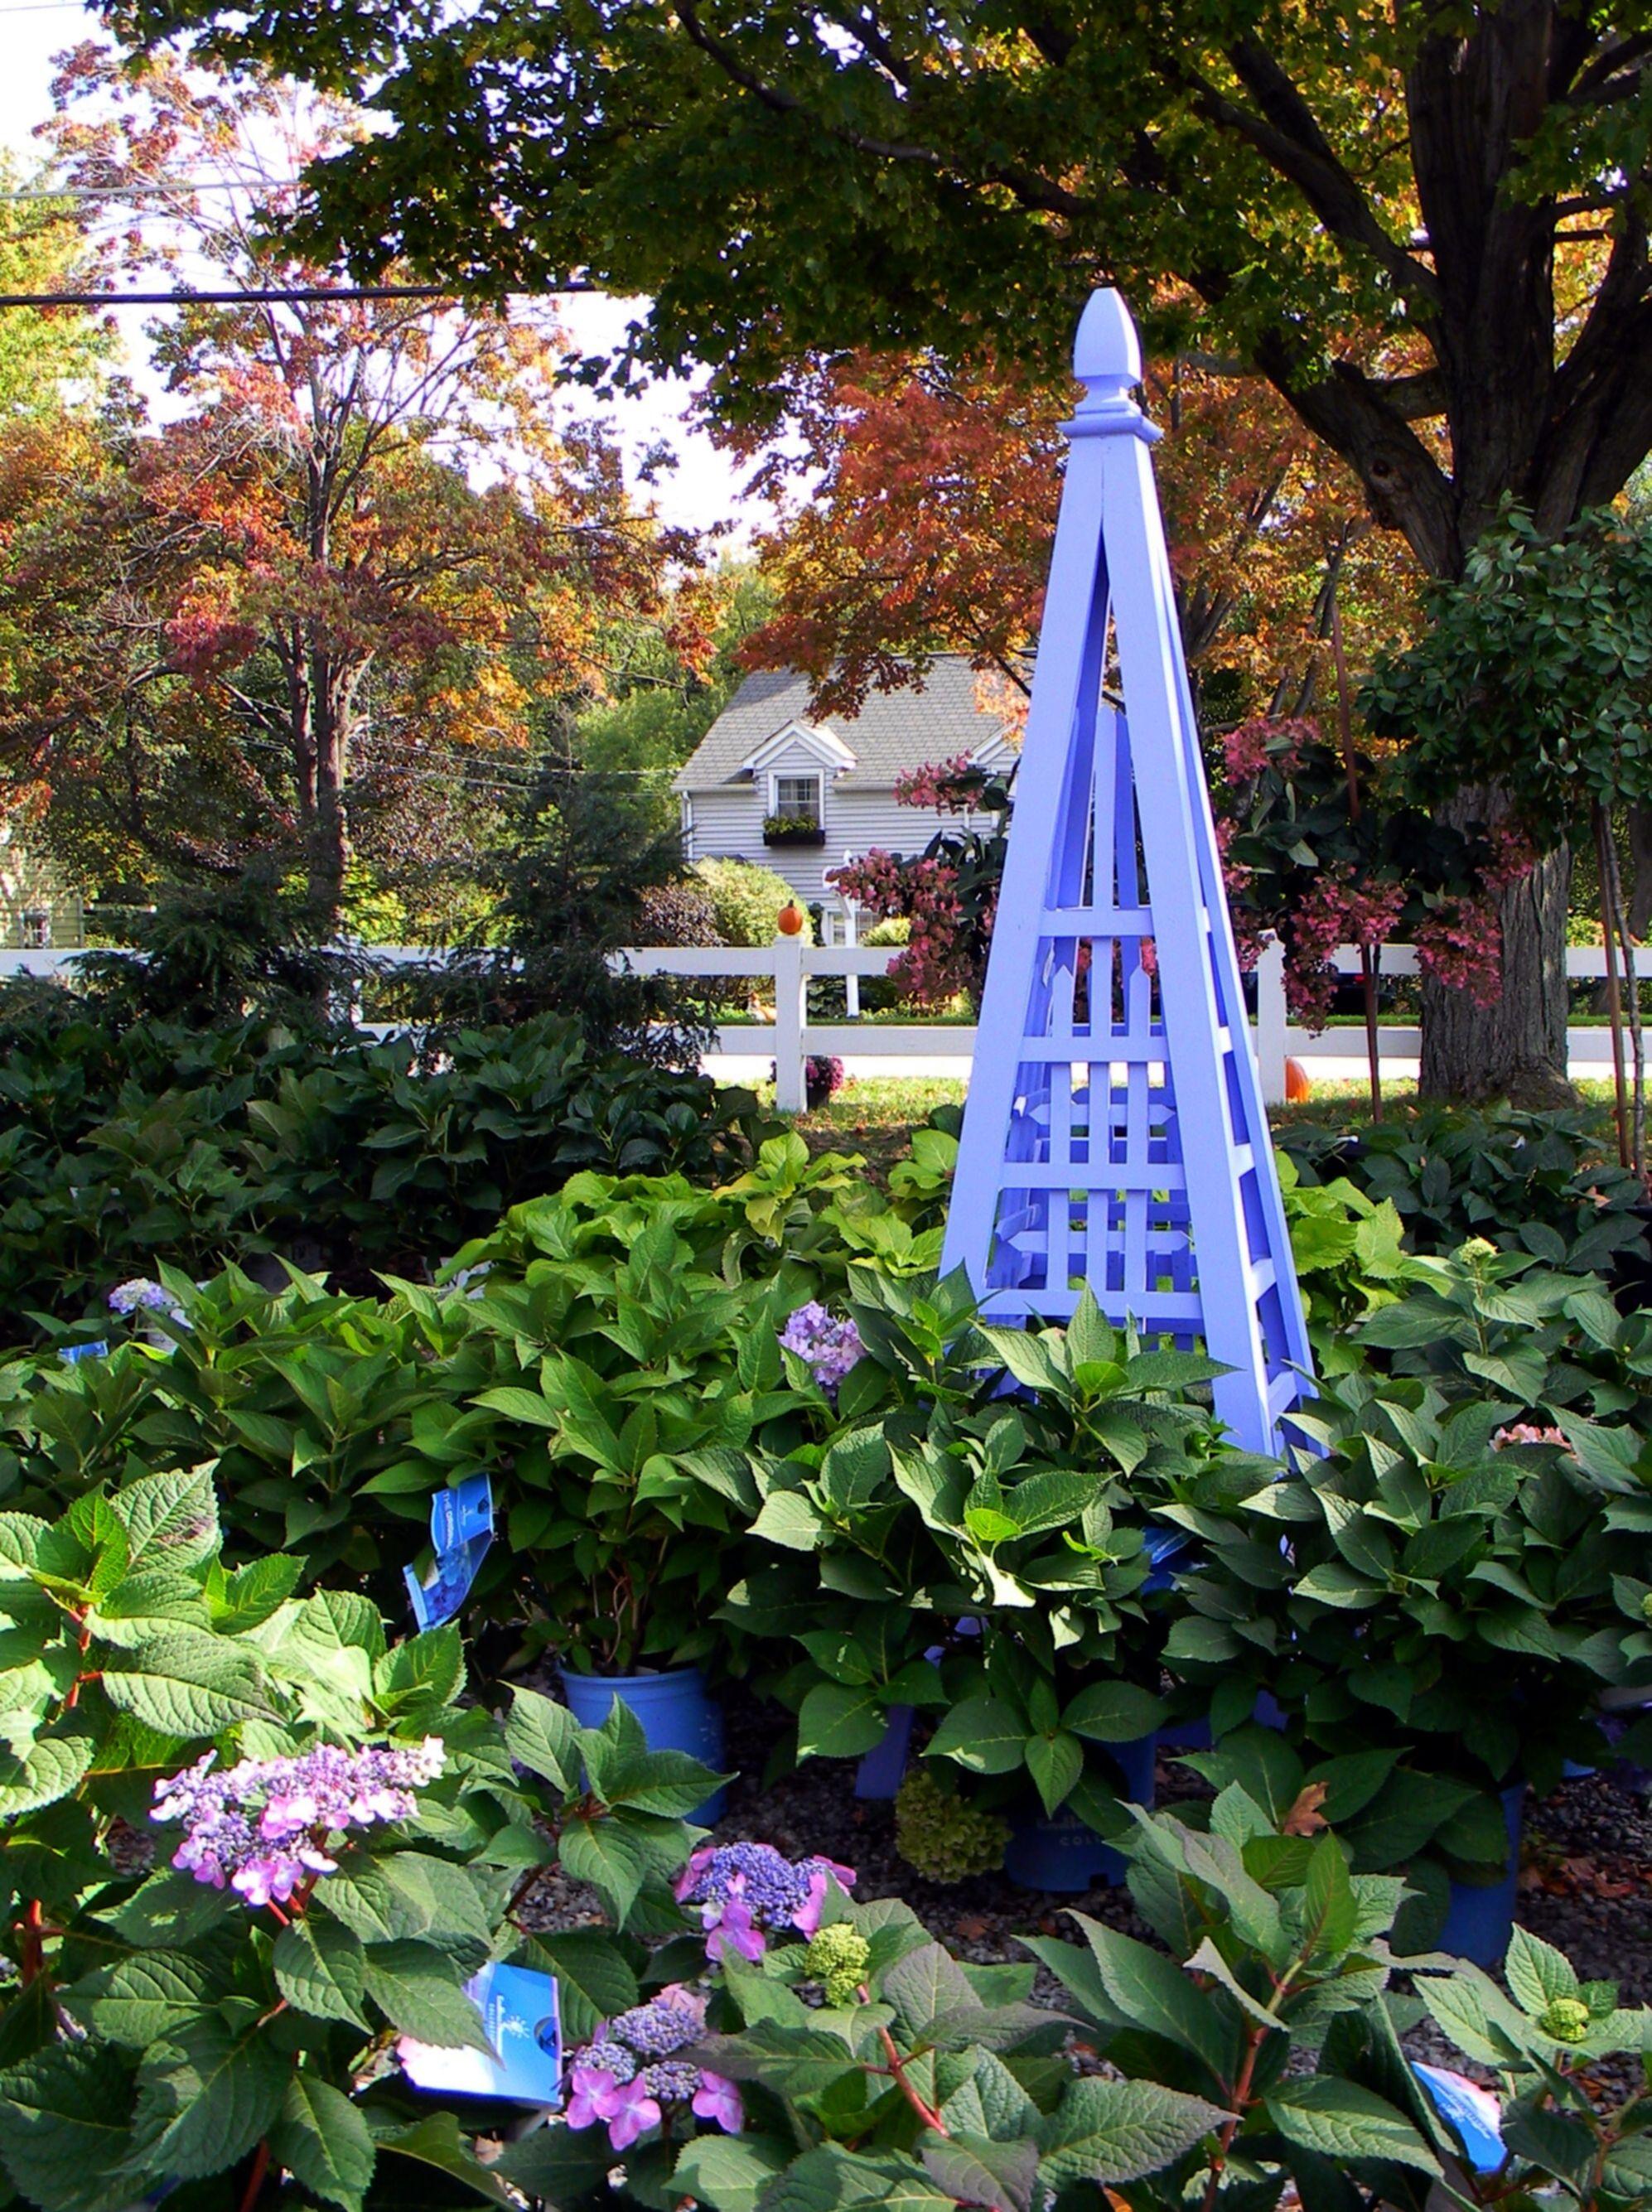 How to make a garden obelisk - 6 Garden Obelisk Painted In Hydrangea From Artisansheds Com